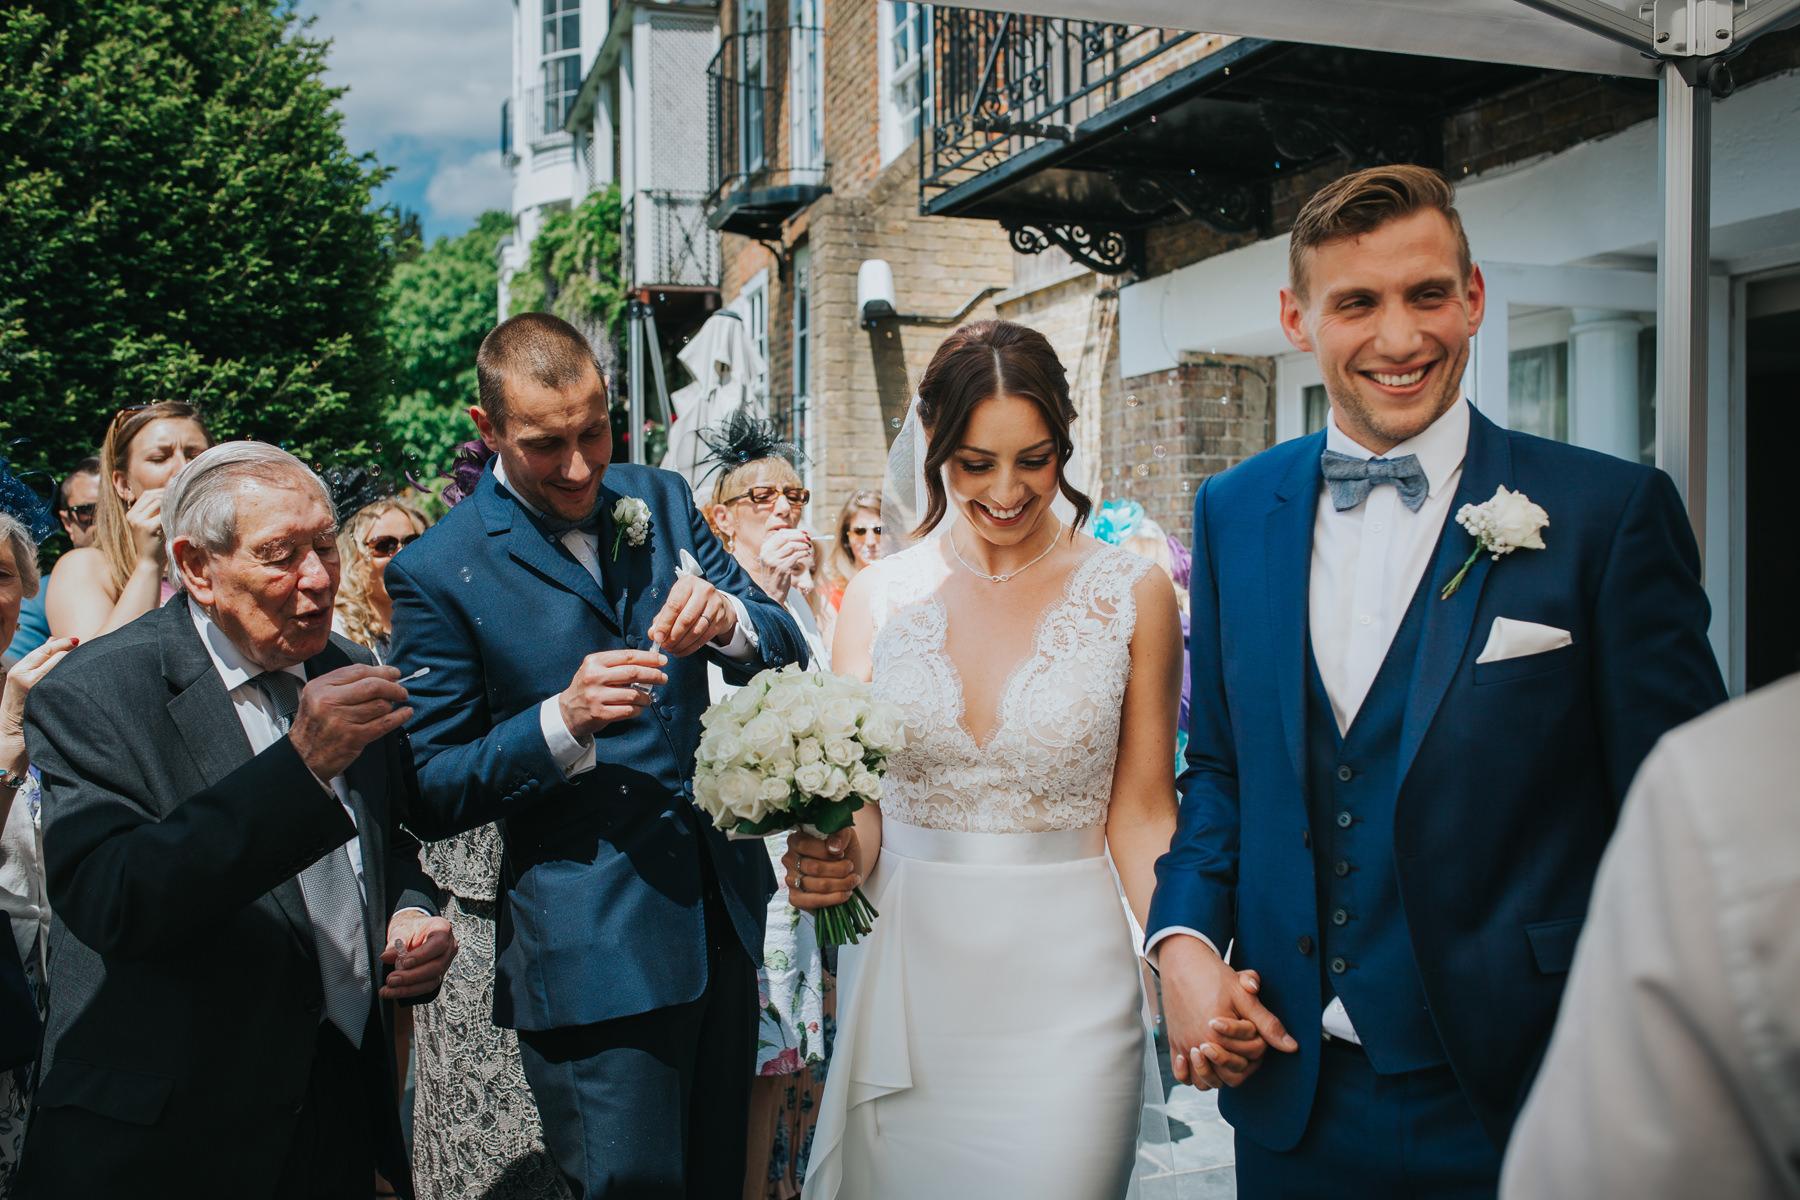 CRL-224-The Bingham Wedding Richmond-groom bride guests blowing bubbles.jpg